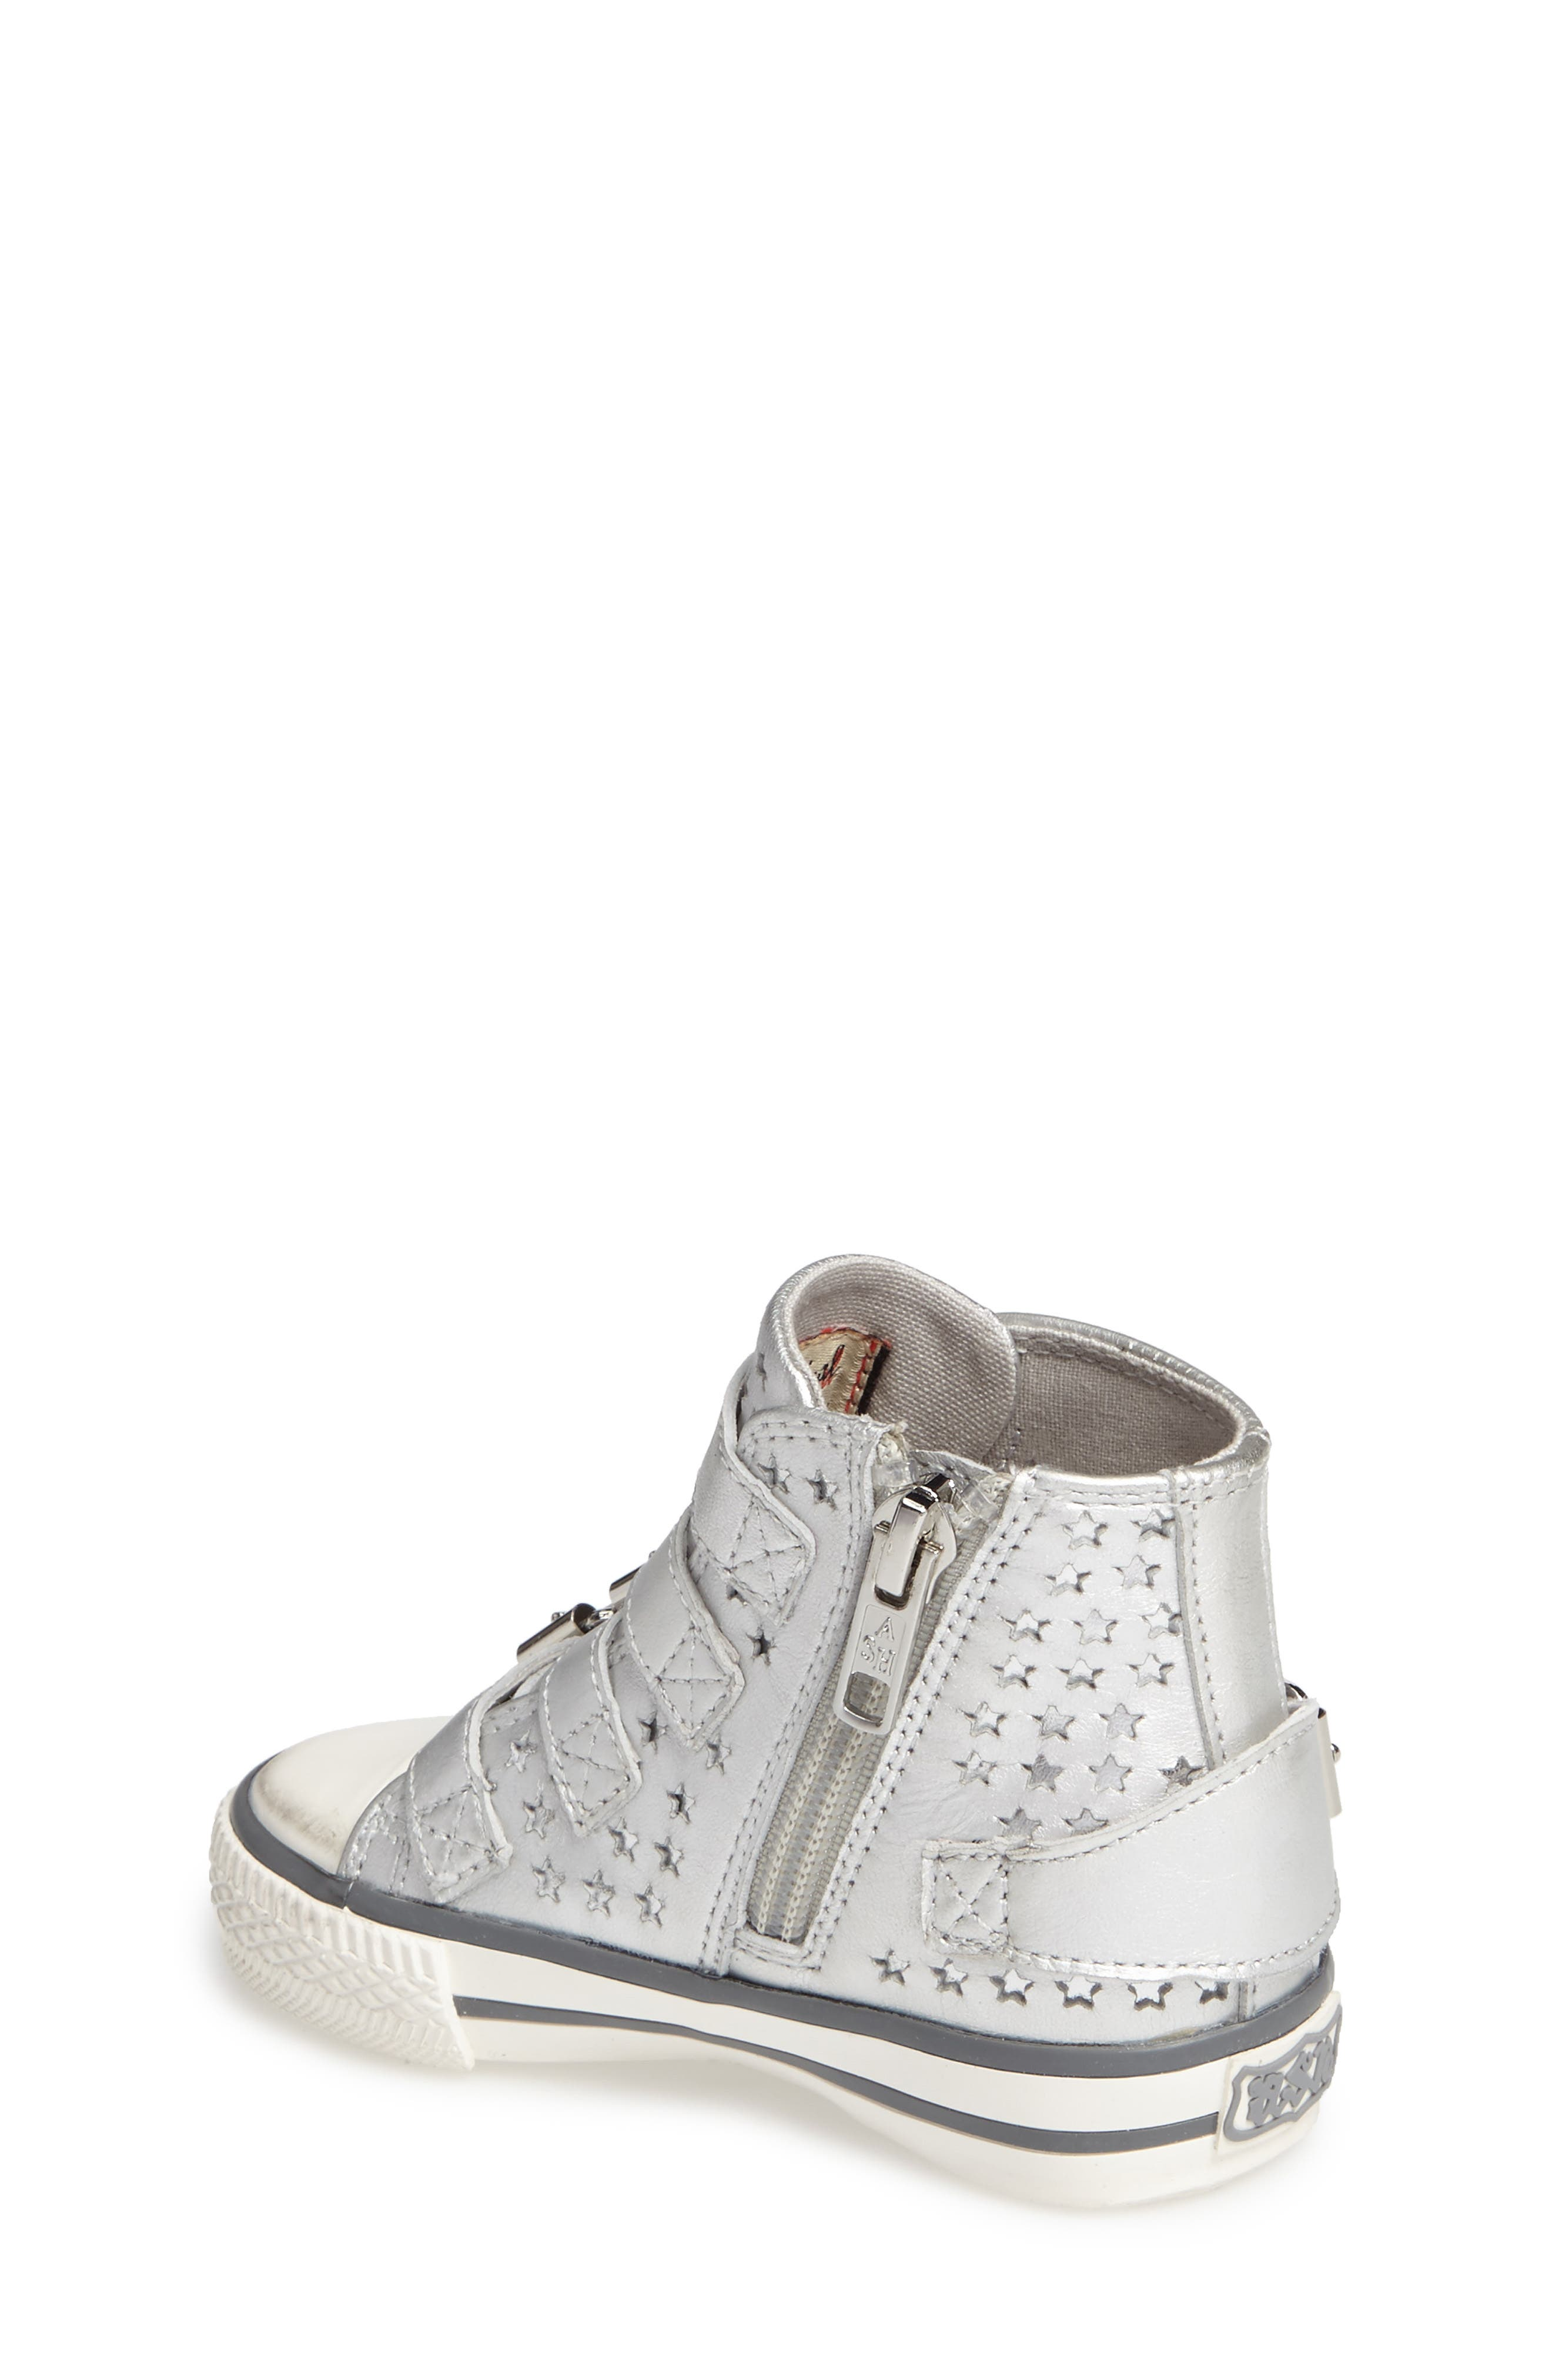 Vava Starboss Buckle Strap High Top Sneaker,                             Alternate thumbnail 2, color,                             041